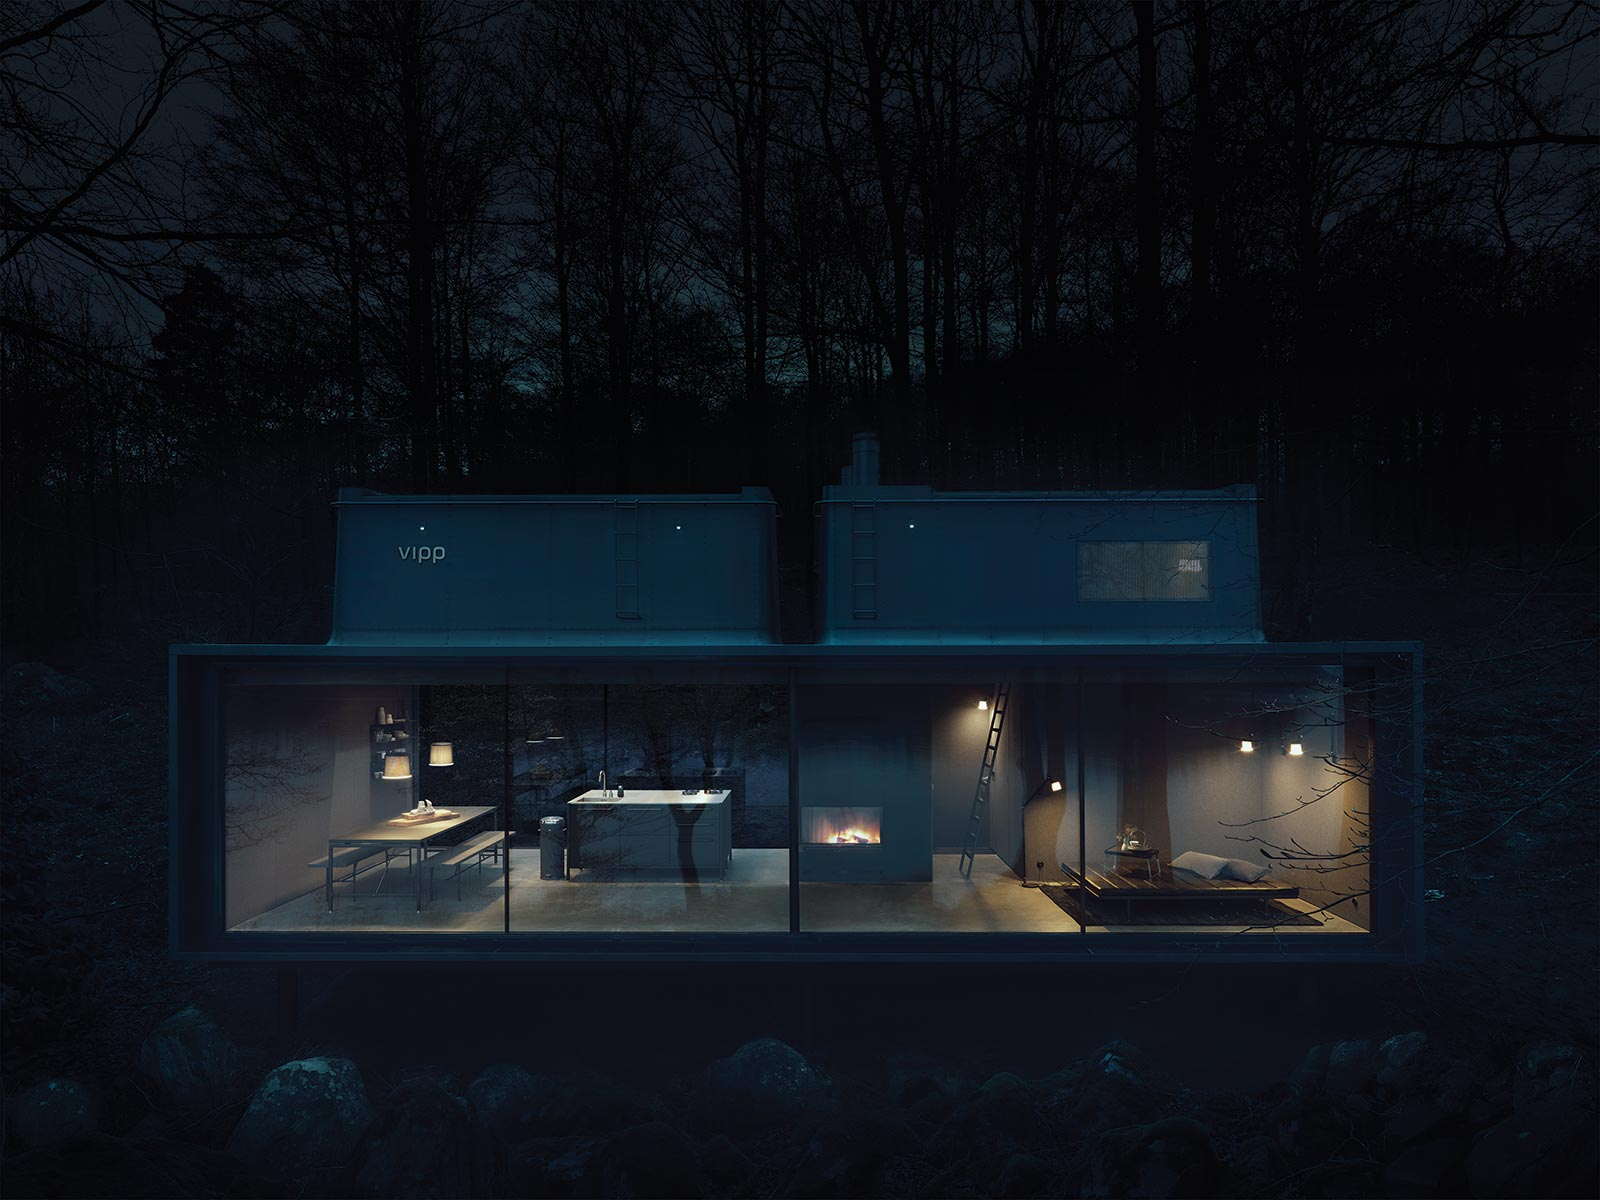 vipps-plug-and-play-getaway-shelter-28